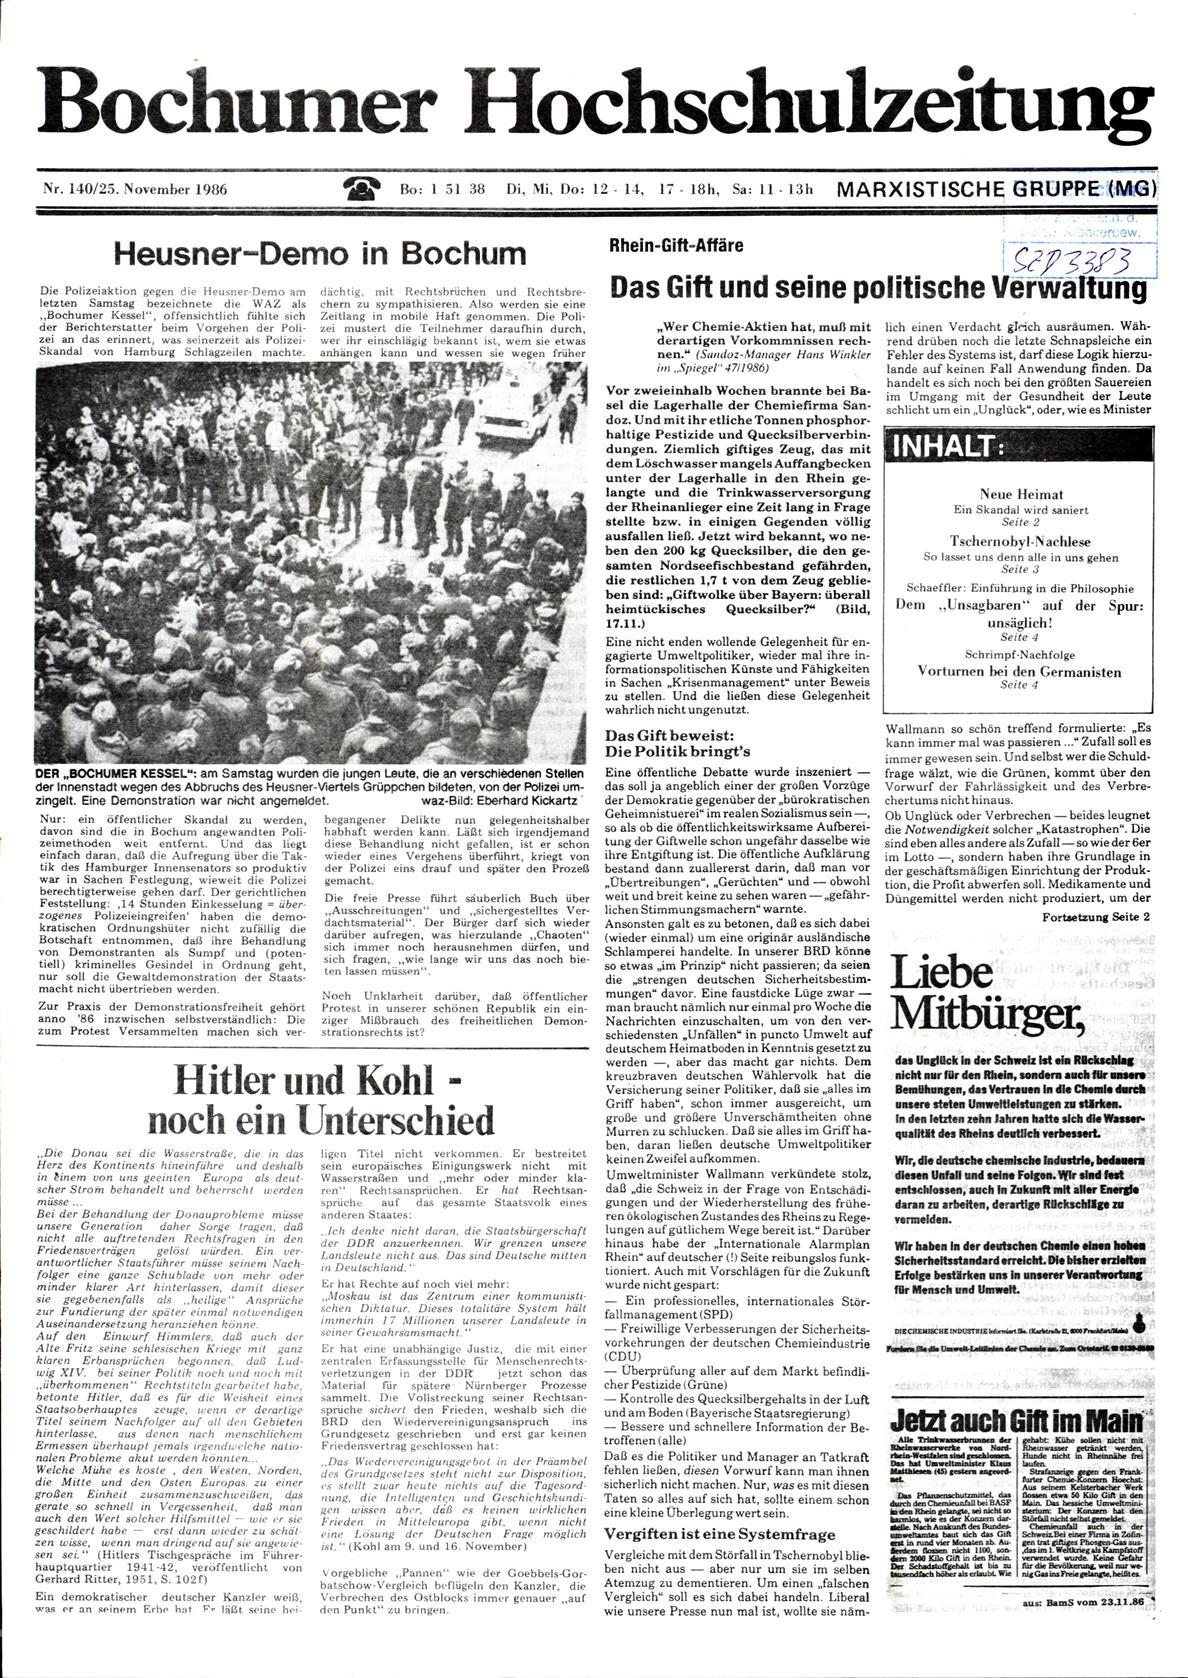 Bochum_BHZ_19861125_140_001